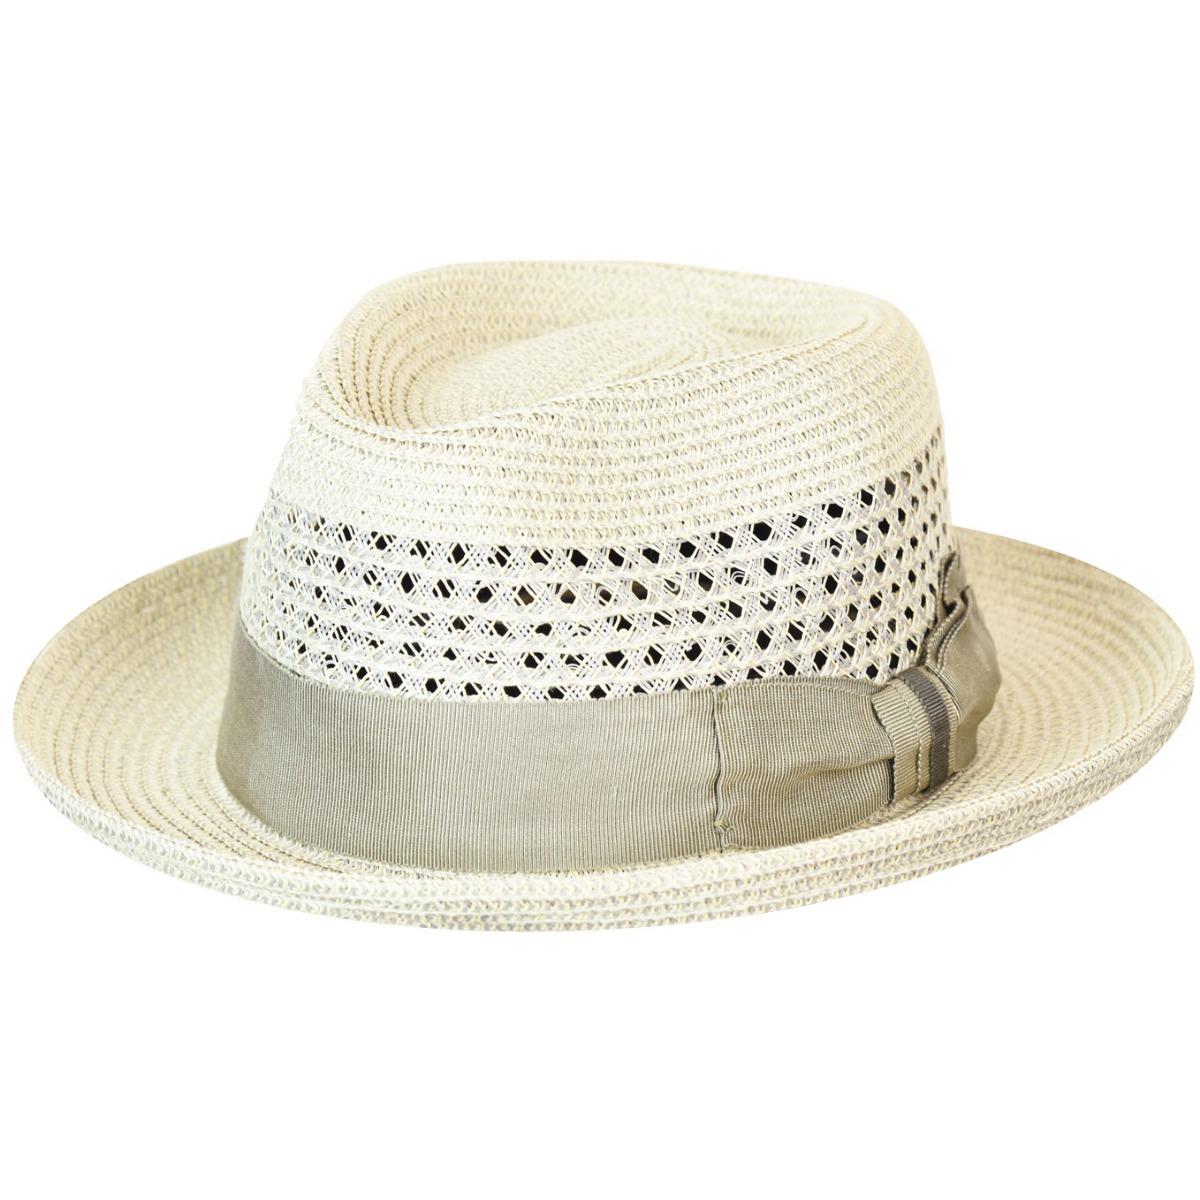 1940s Mens Hats | Fedora, Homburg, Pork Pie Hats Wilshire Braided Fedora $80.00 AT vintagedancer.com